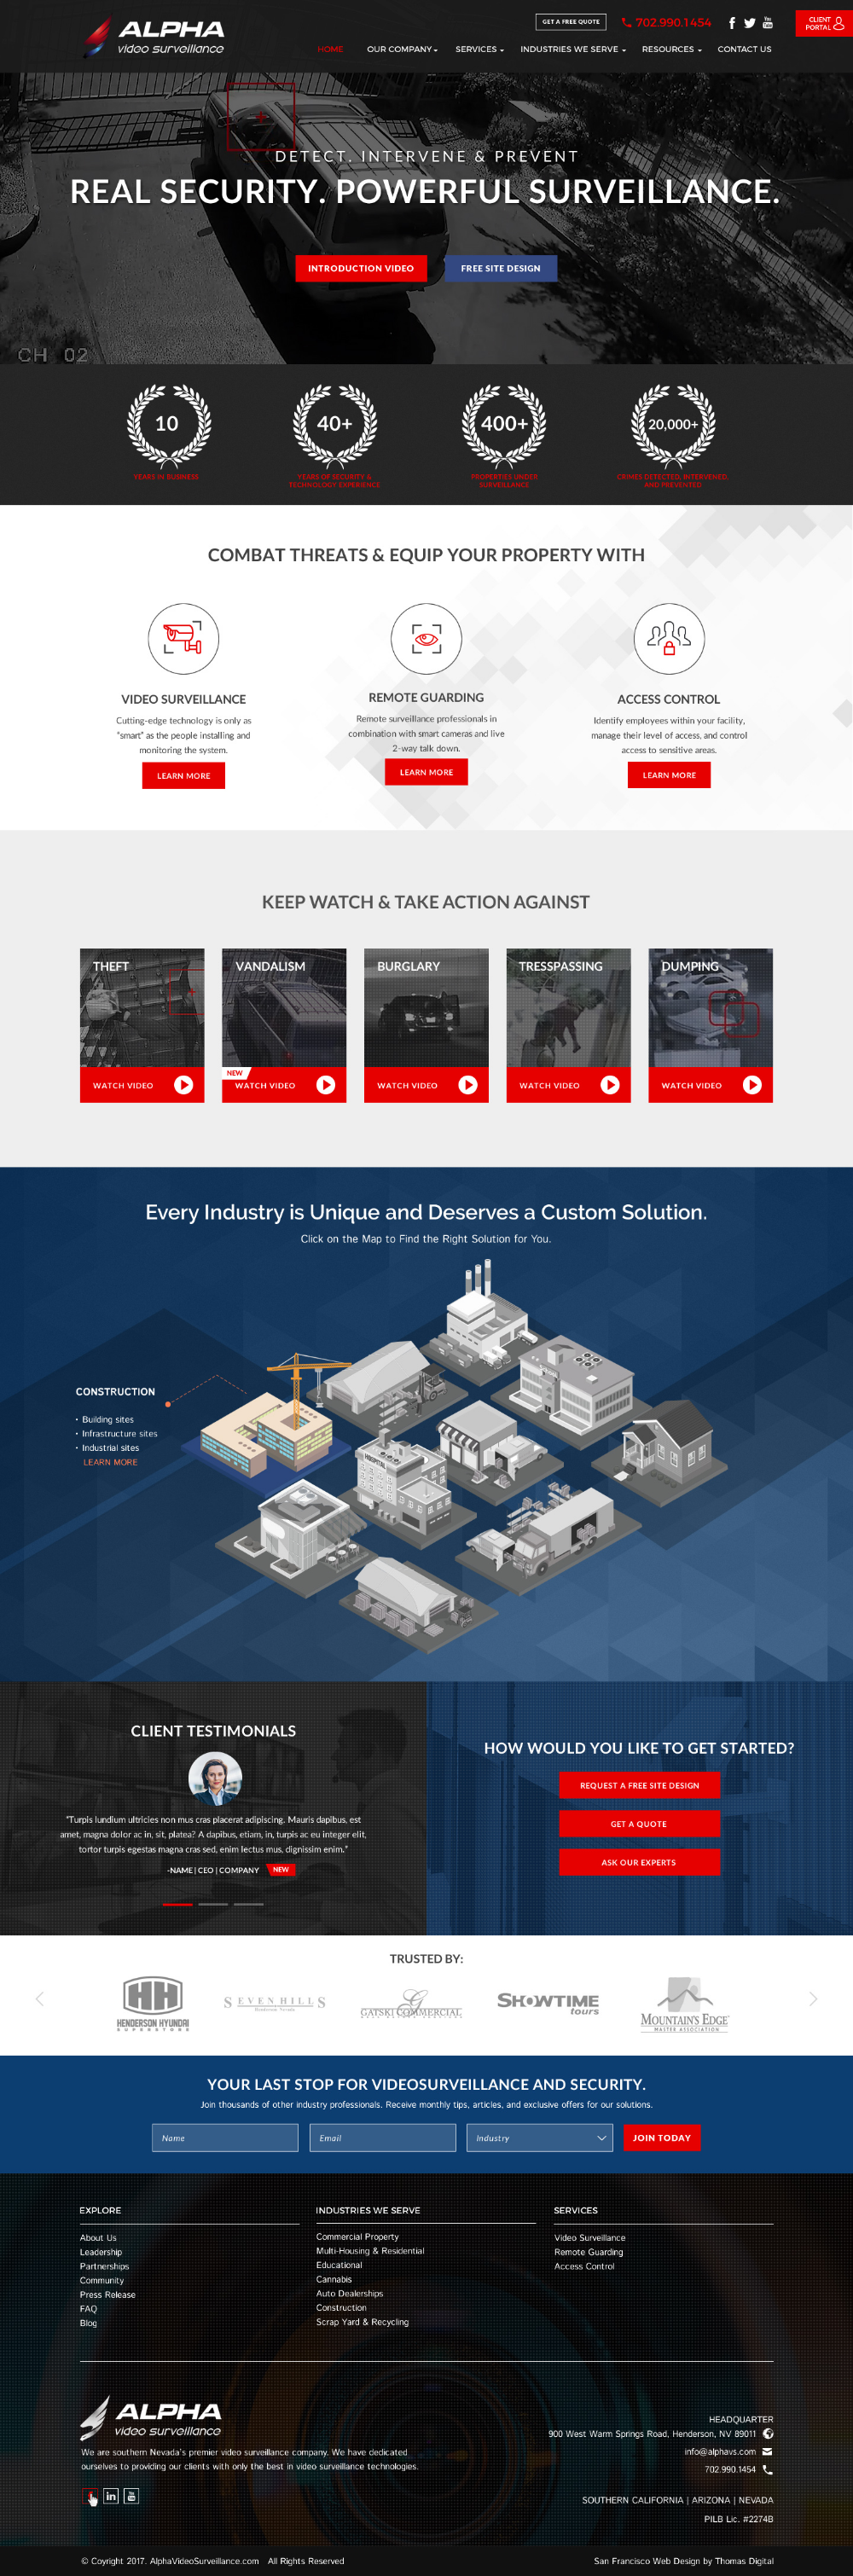 Alpha Video Surveillance Web Design Web Design Firm Web Design Company